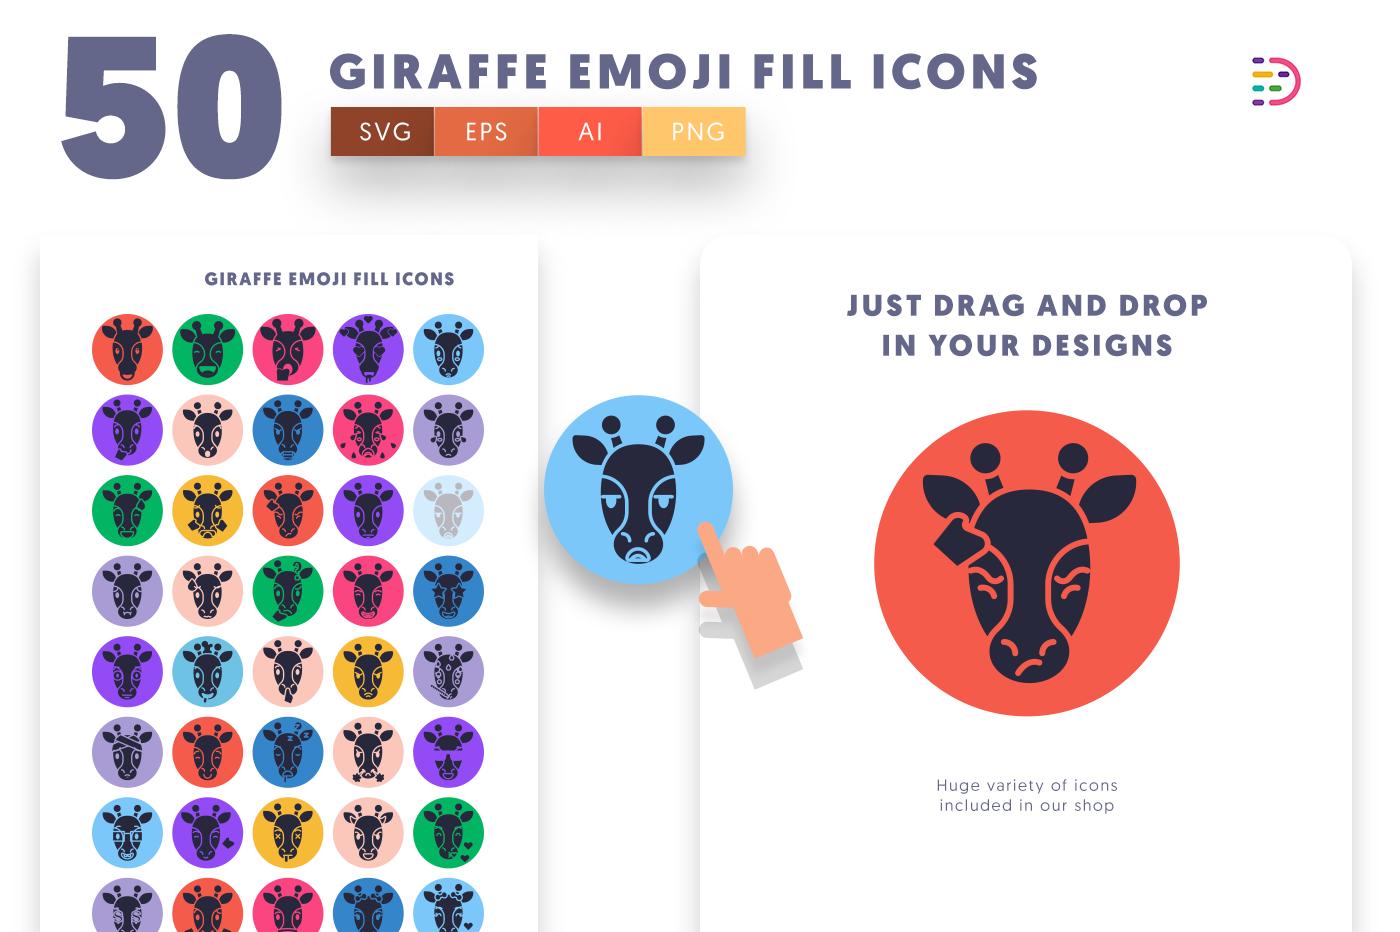 Drag and drop vector 50 Giraffe Emoji Fill Icons